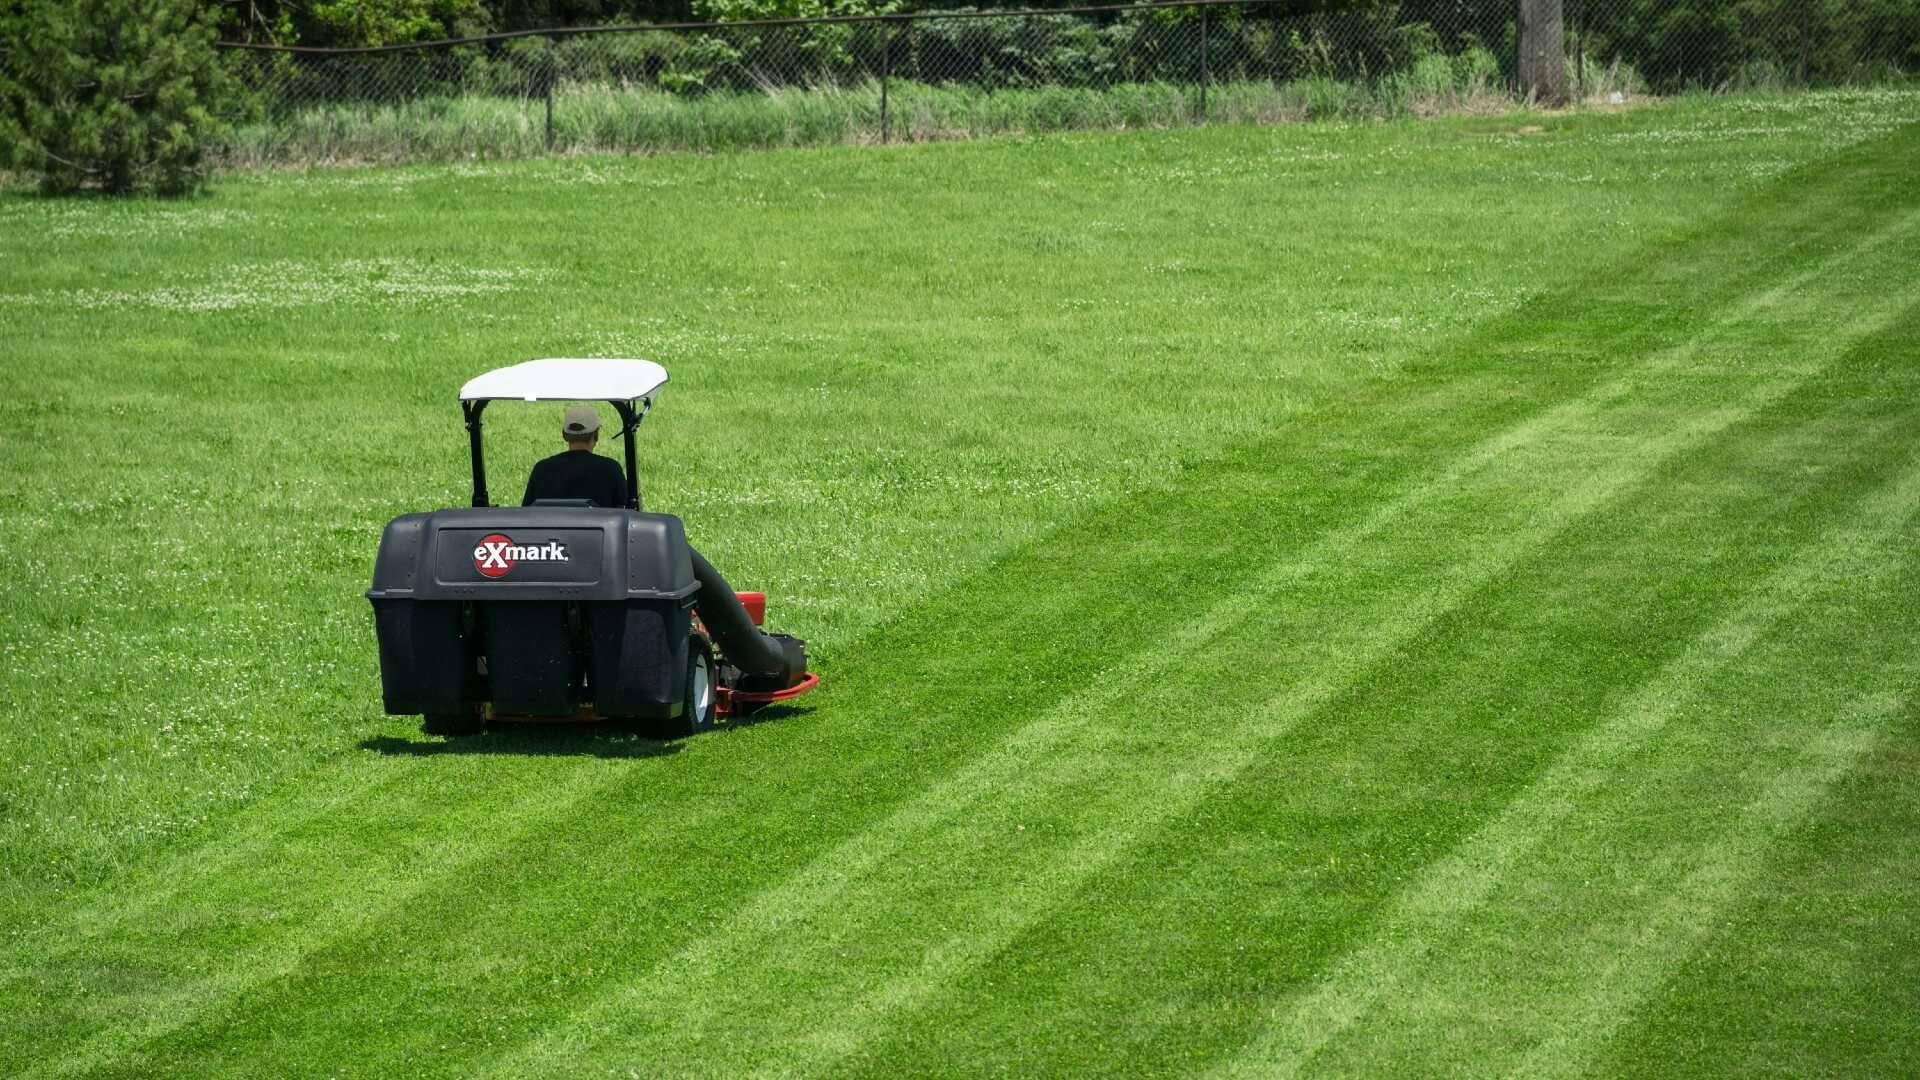 An Exmark mower micro mulching lawn clippings